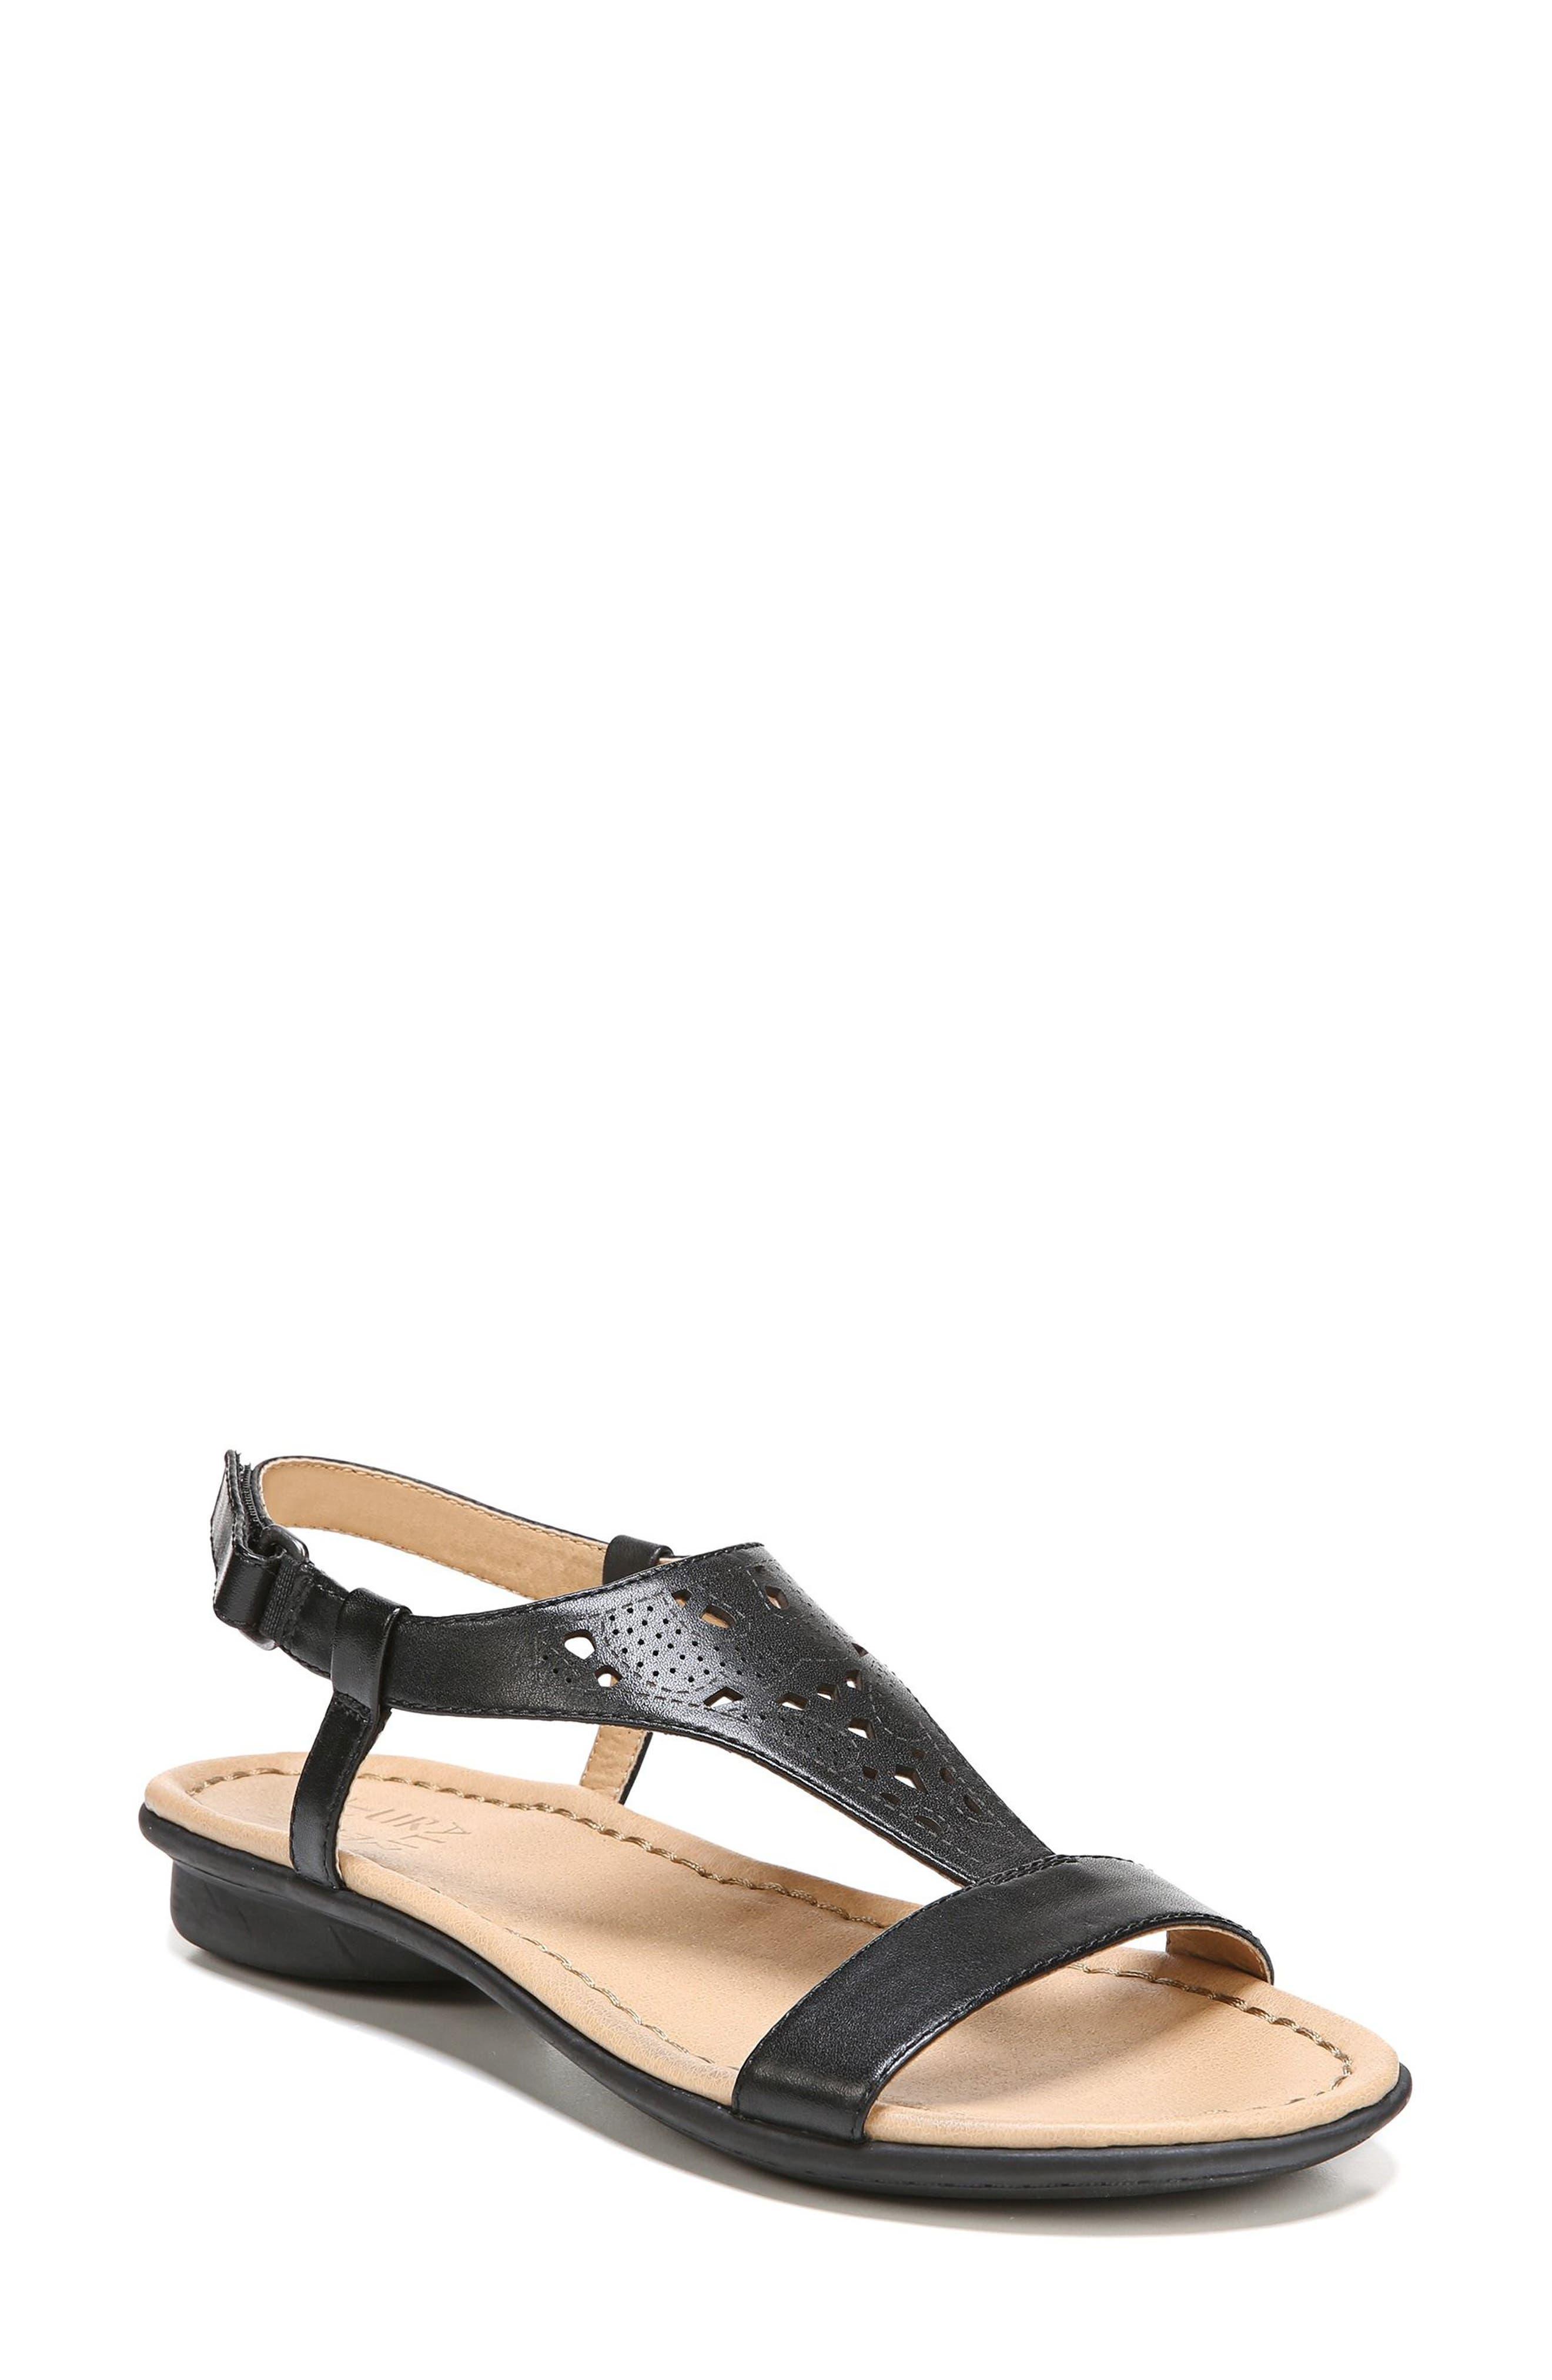 Windham Sandal,                         Main,                         color, BLACK LEATHER